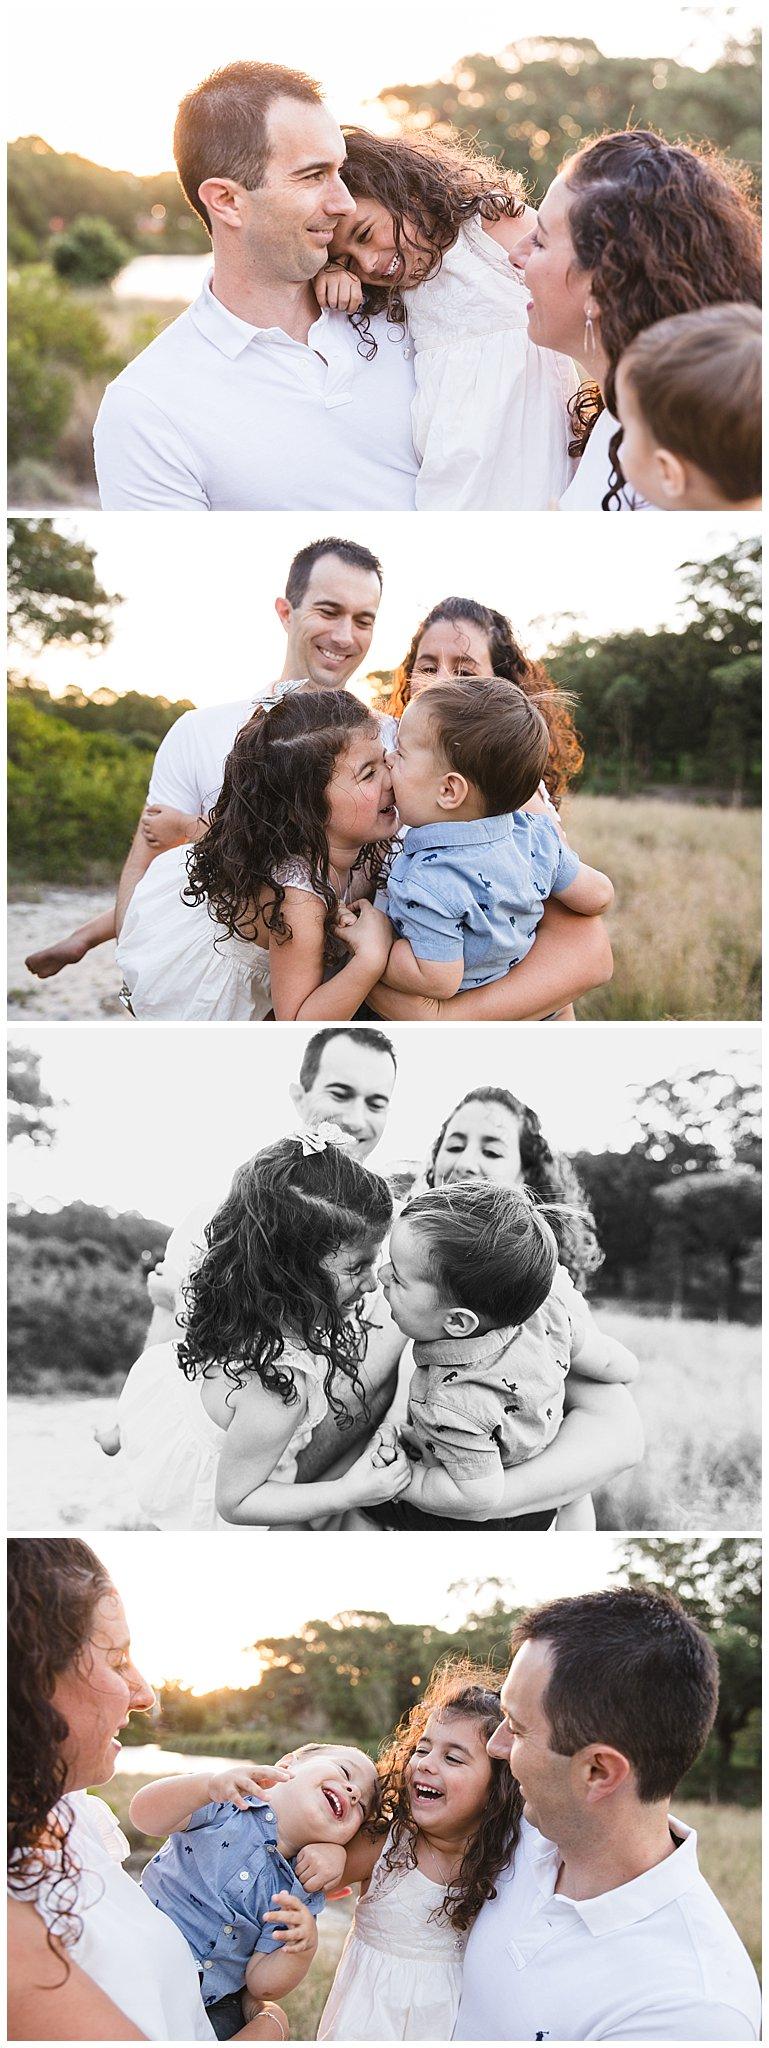 Family lifestyle photography_0001.jpg